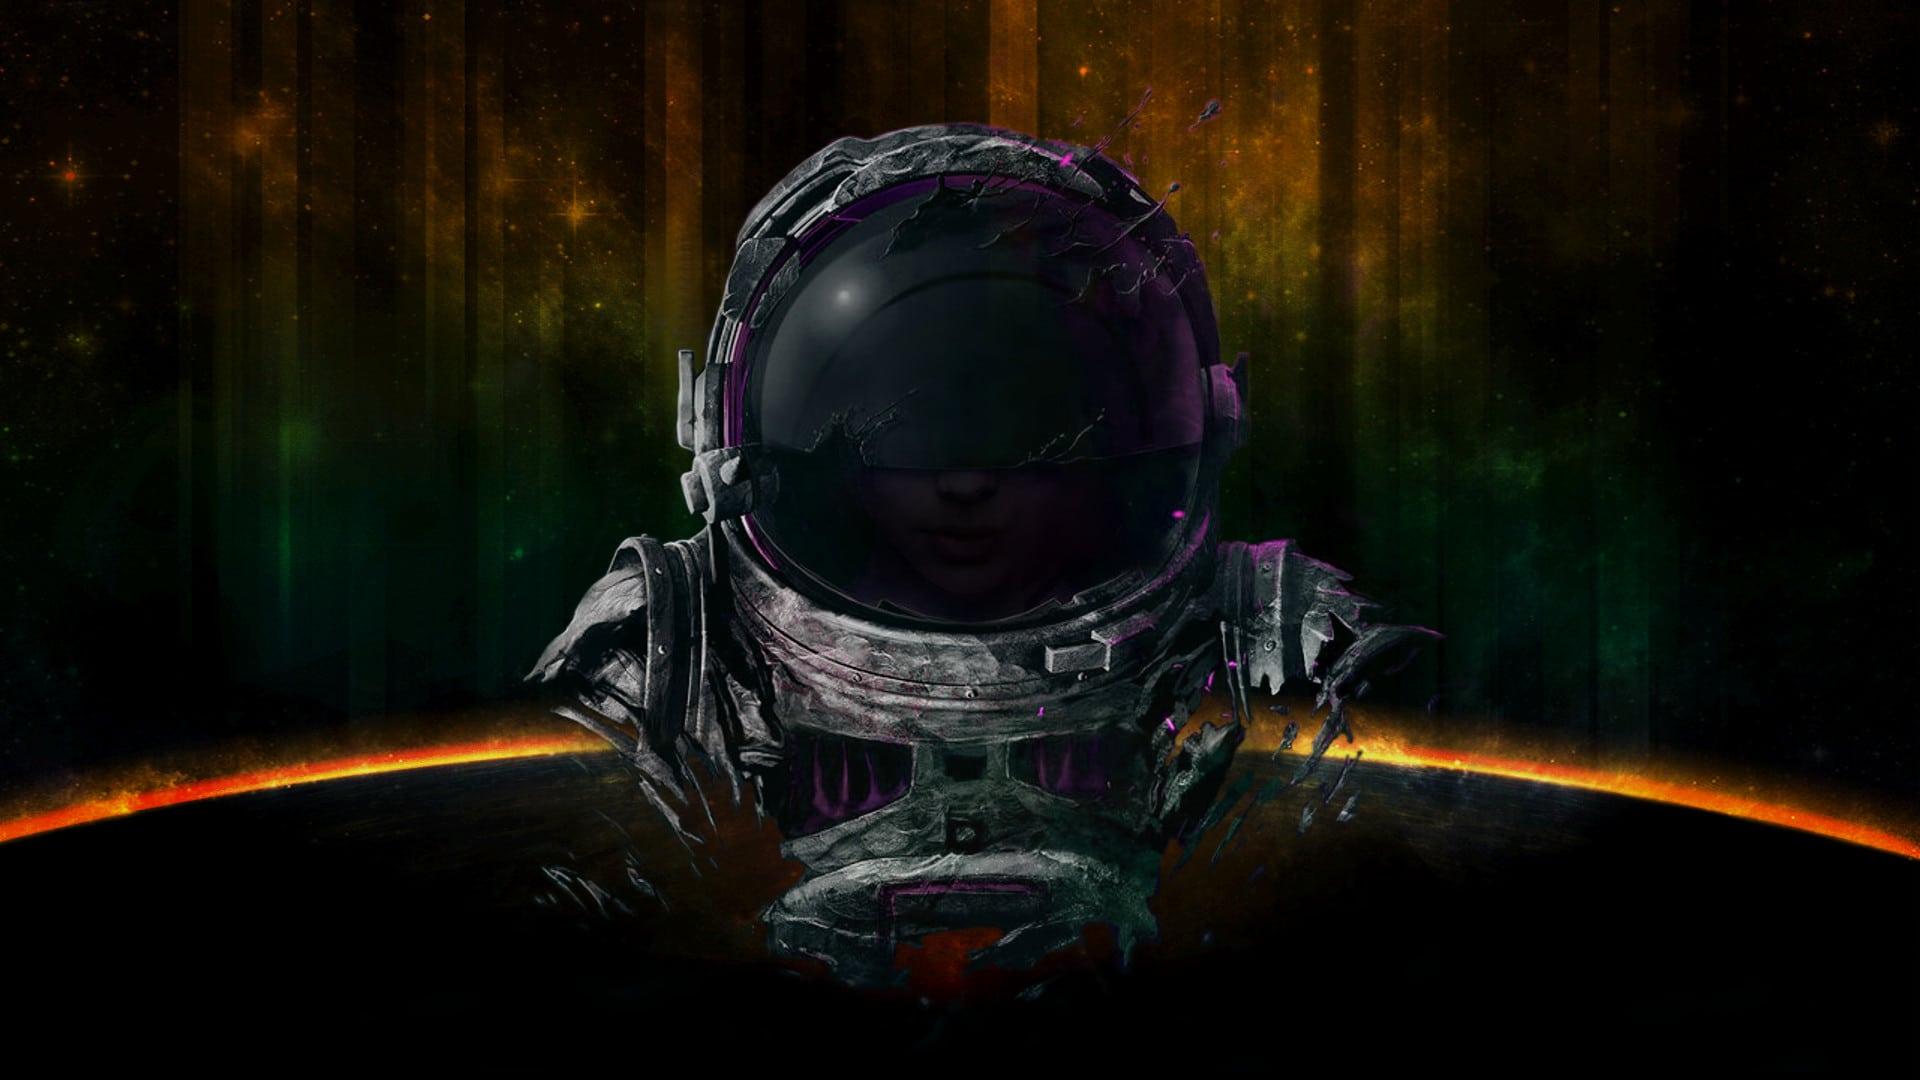 Parrot Security Os Wallpapers Sci Fi Space Pilot 1920x1080 Wallpaper Teahub Io